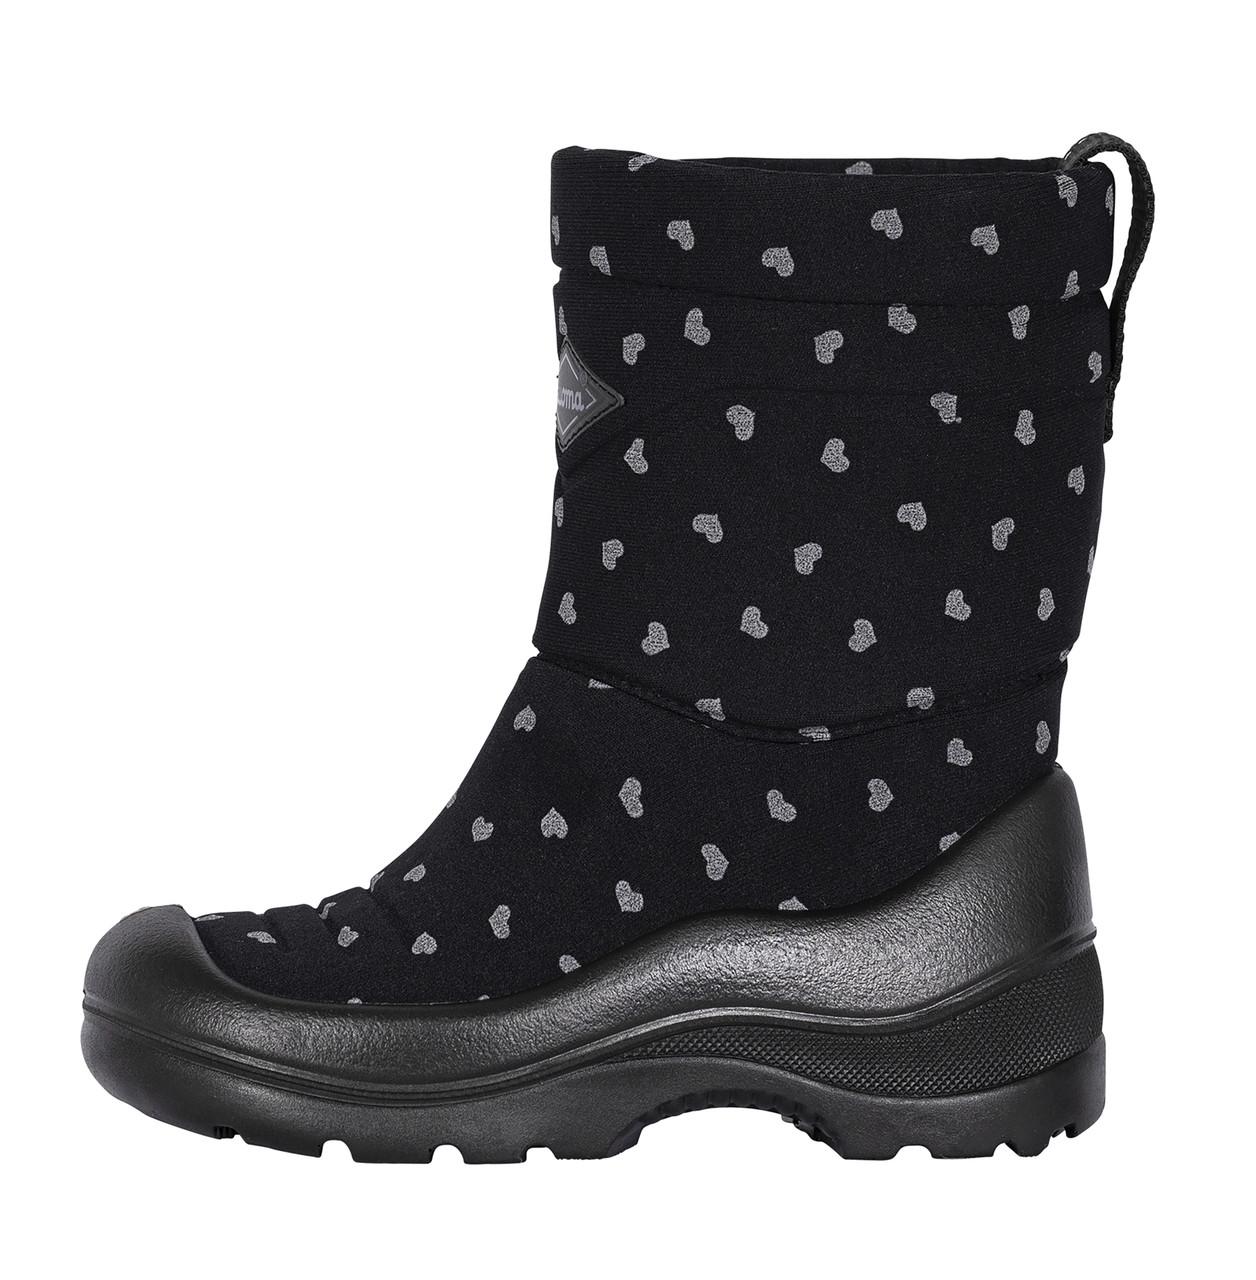 Обувь взрослая Kuoma LumiSnow Black Cute